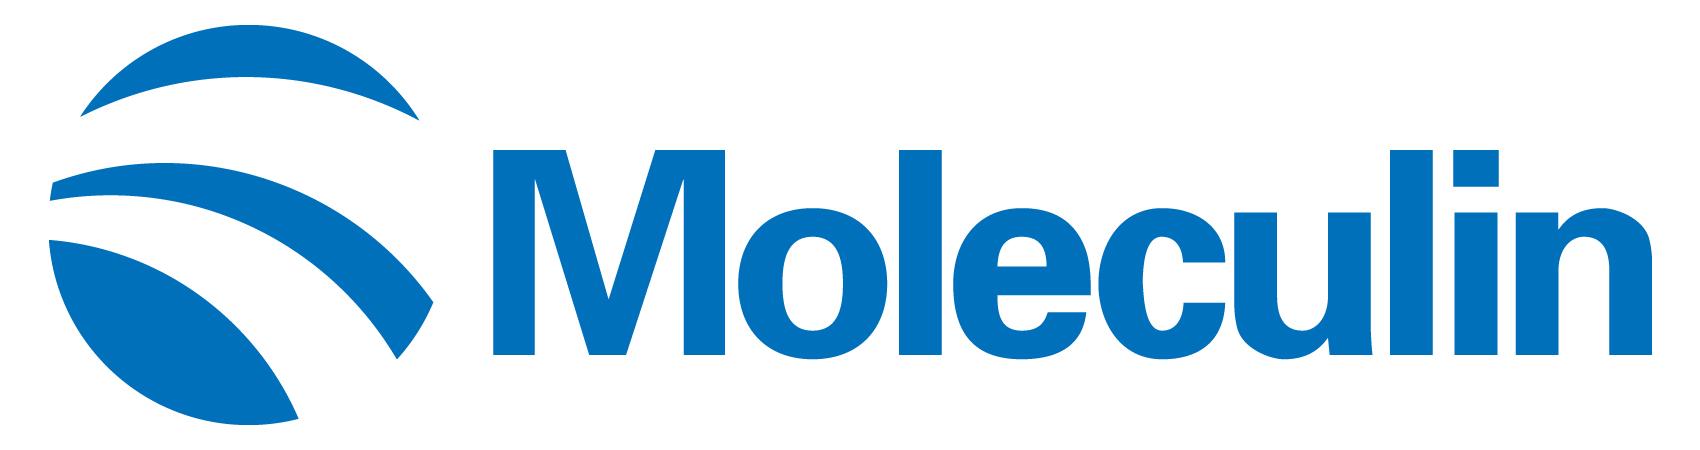 MOLECULIN-LOGO_HORIZ.JPG